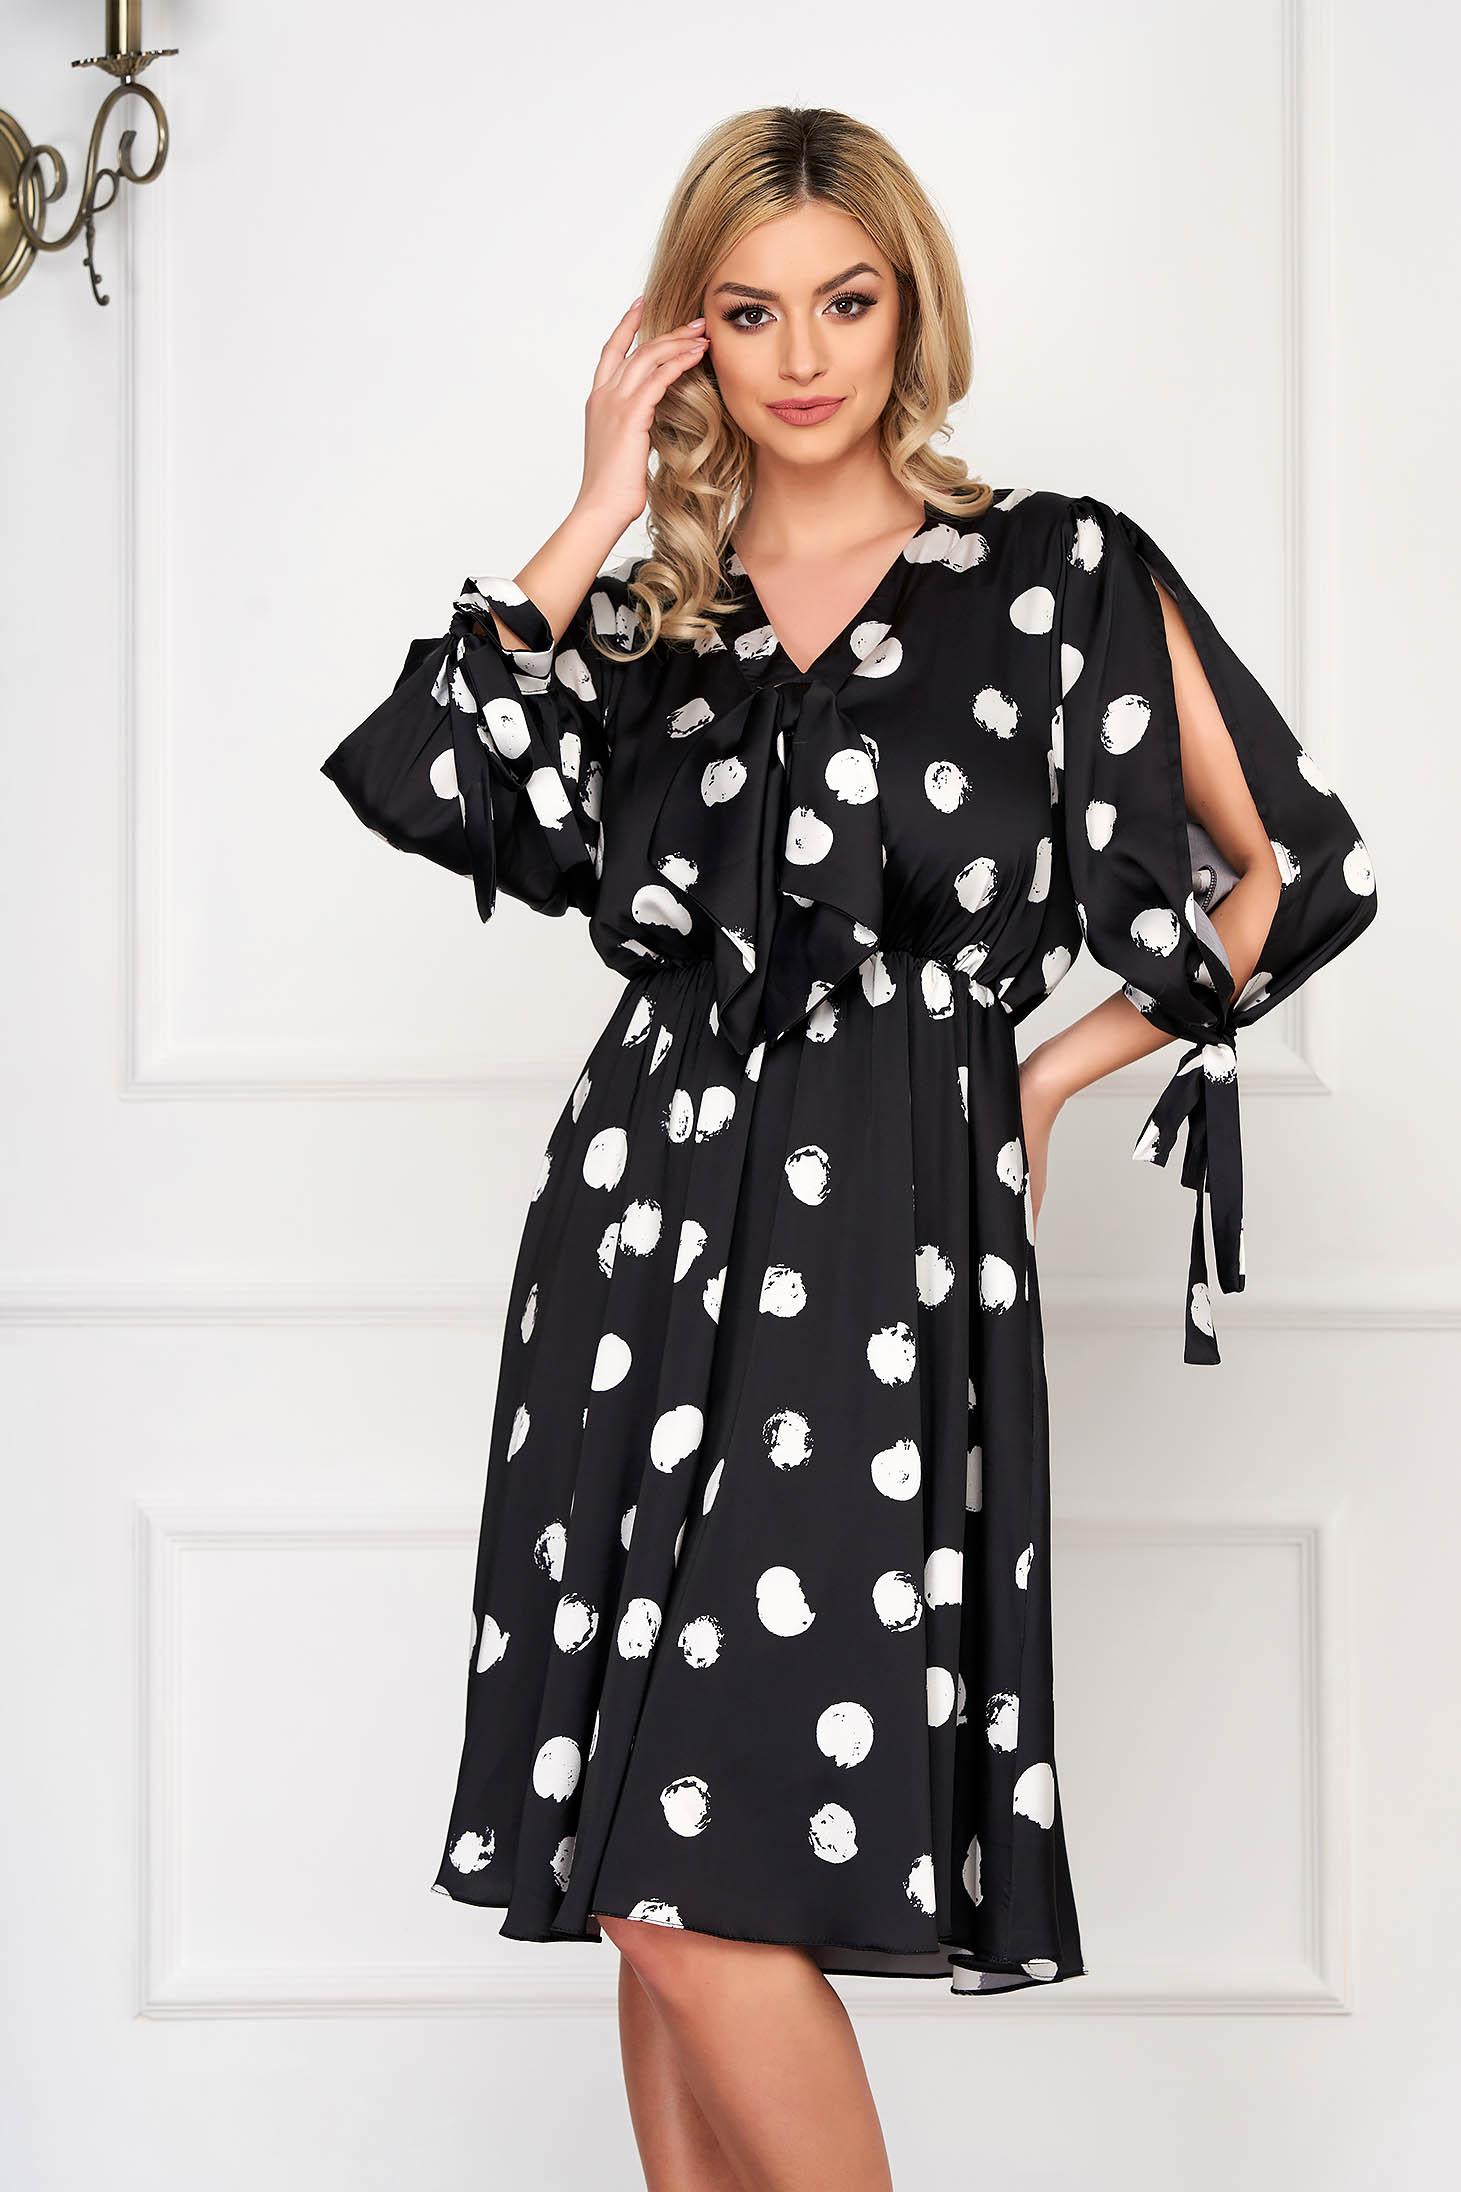 Black dress elegant midi cloche dots print from satin with elastic waist